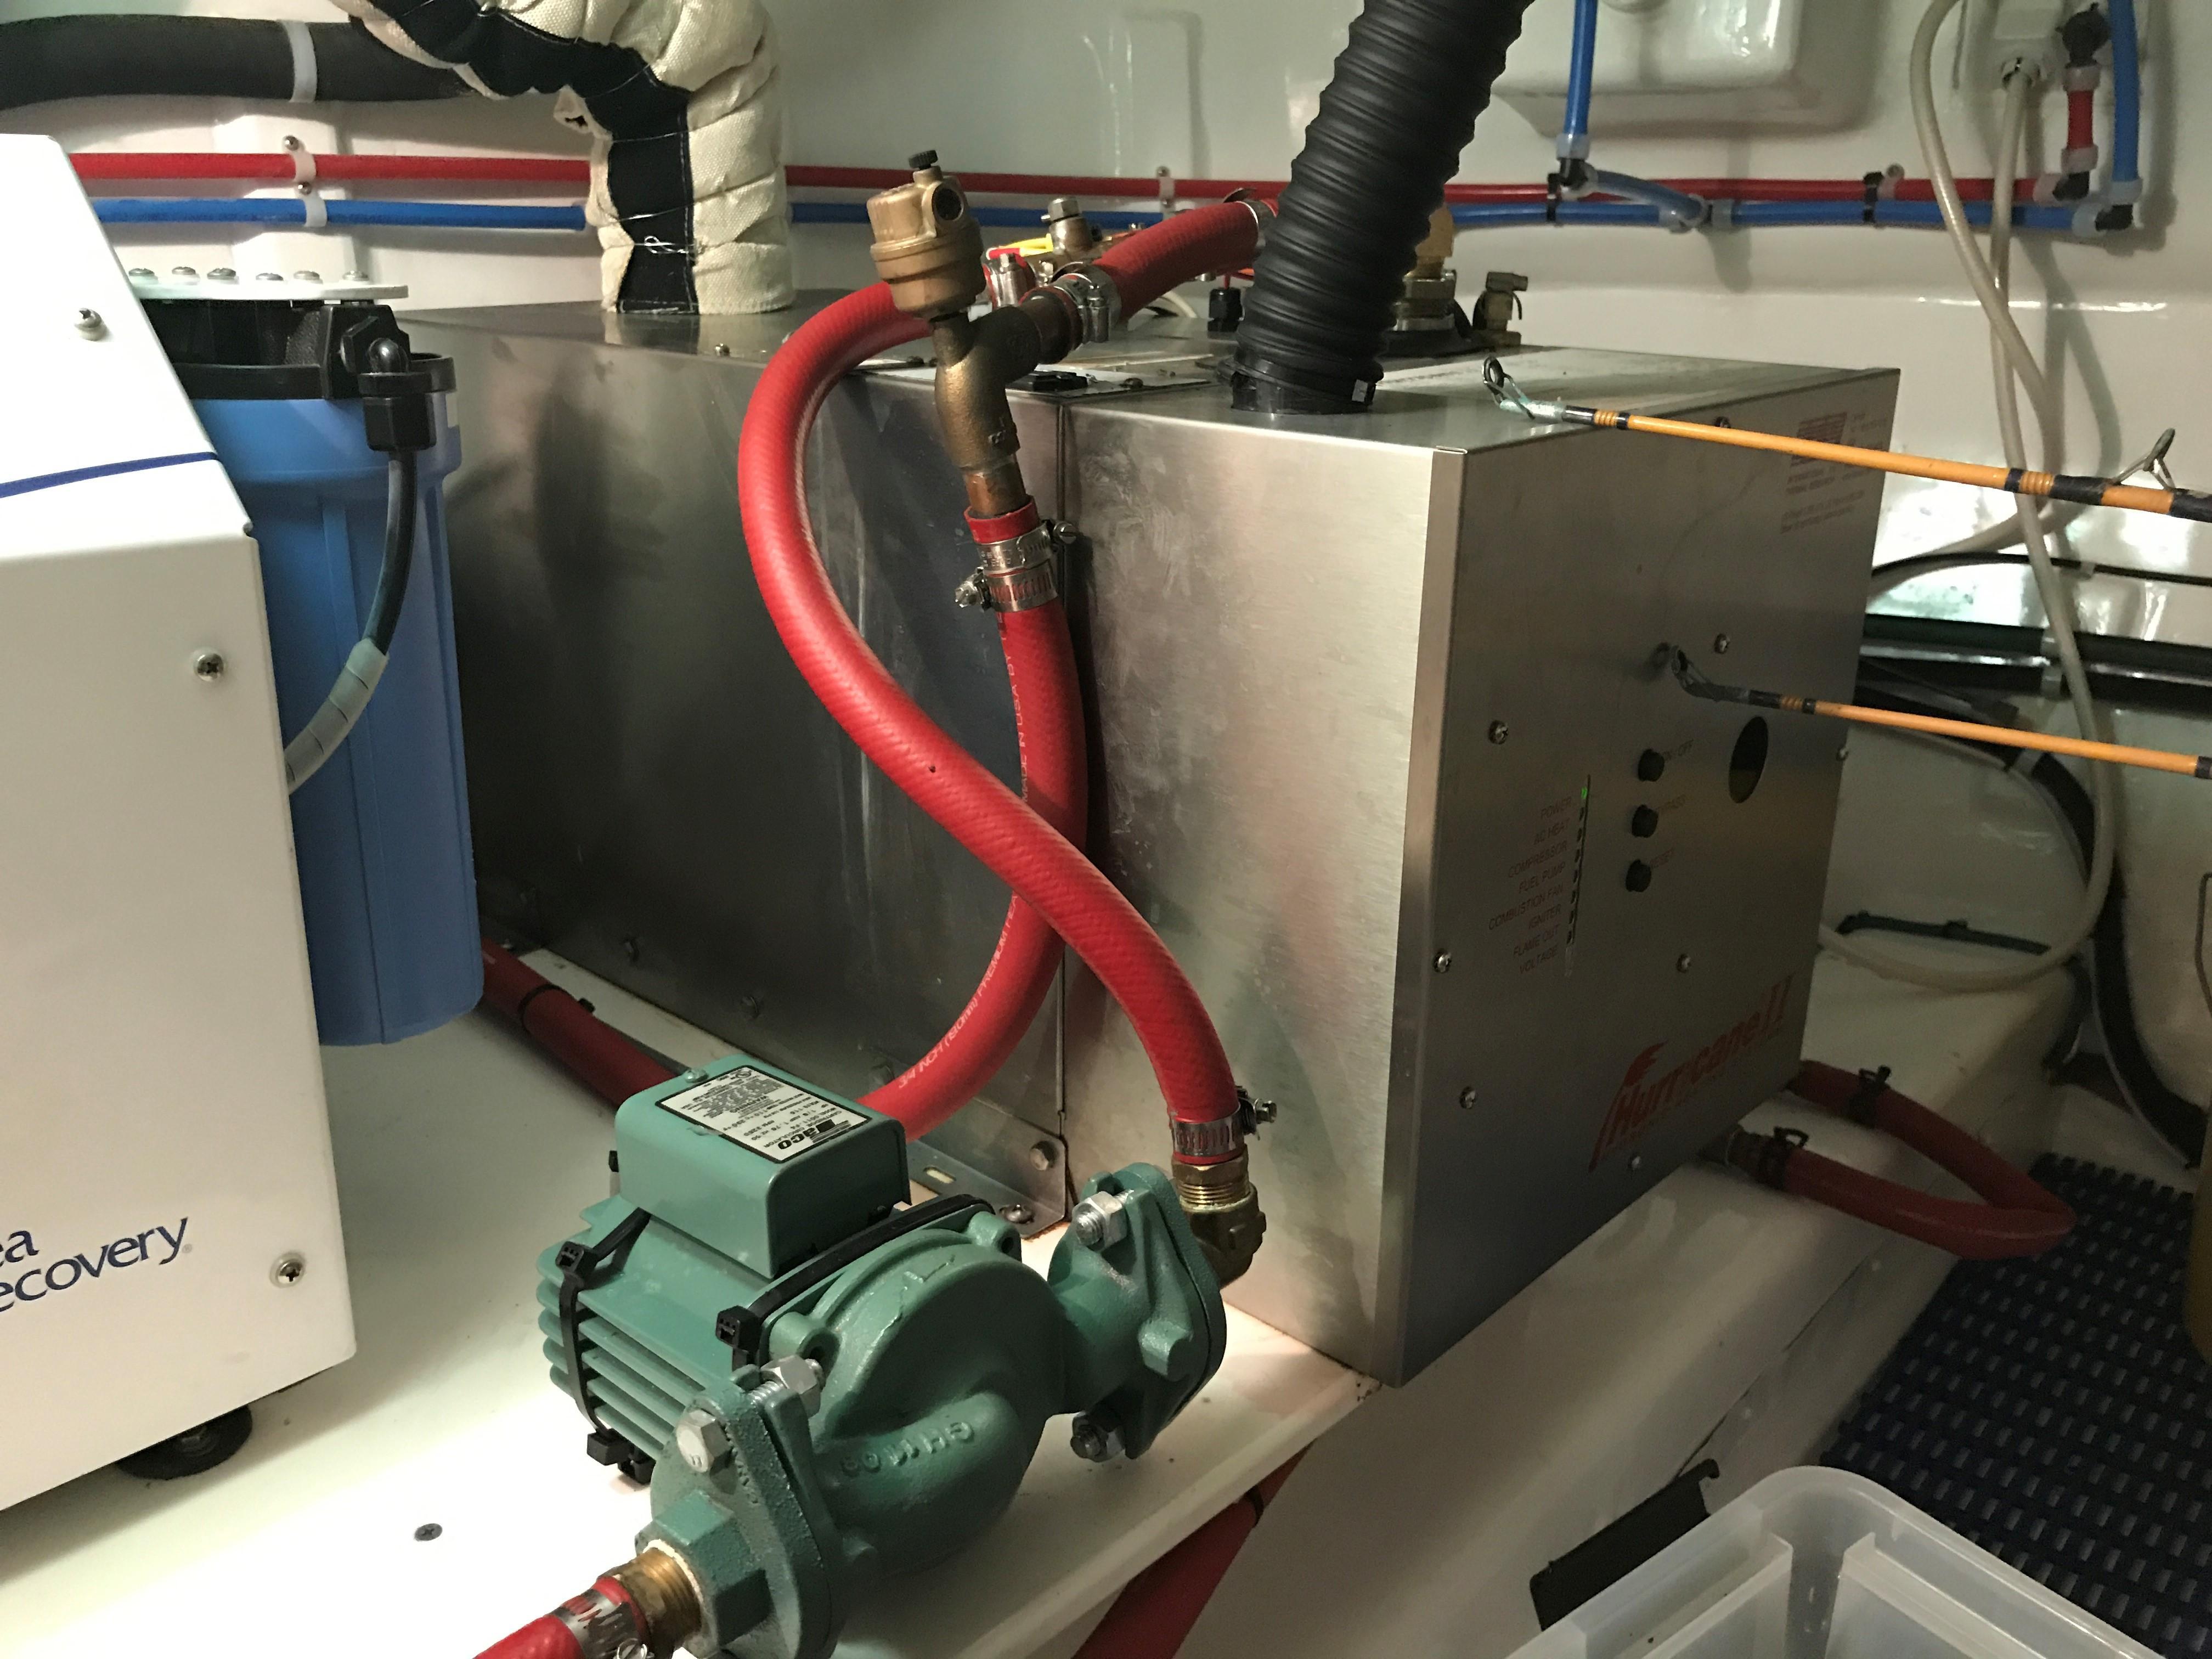 Hurricane hydronic heater